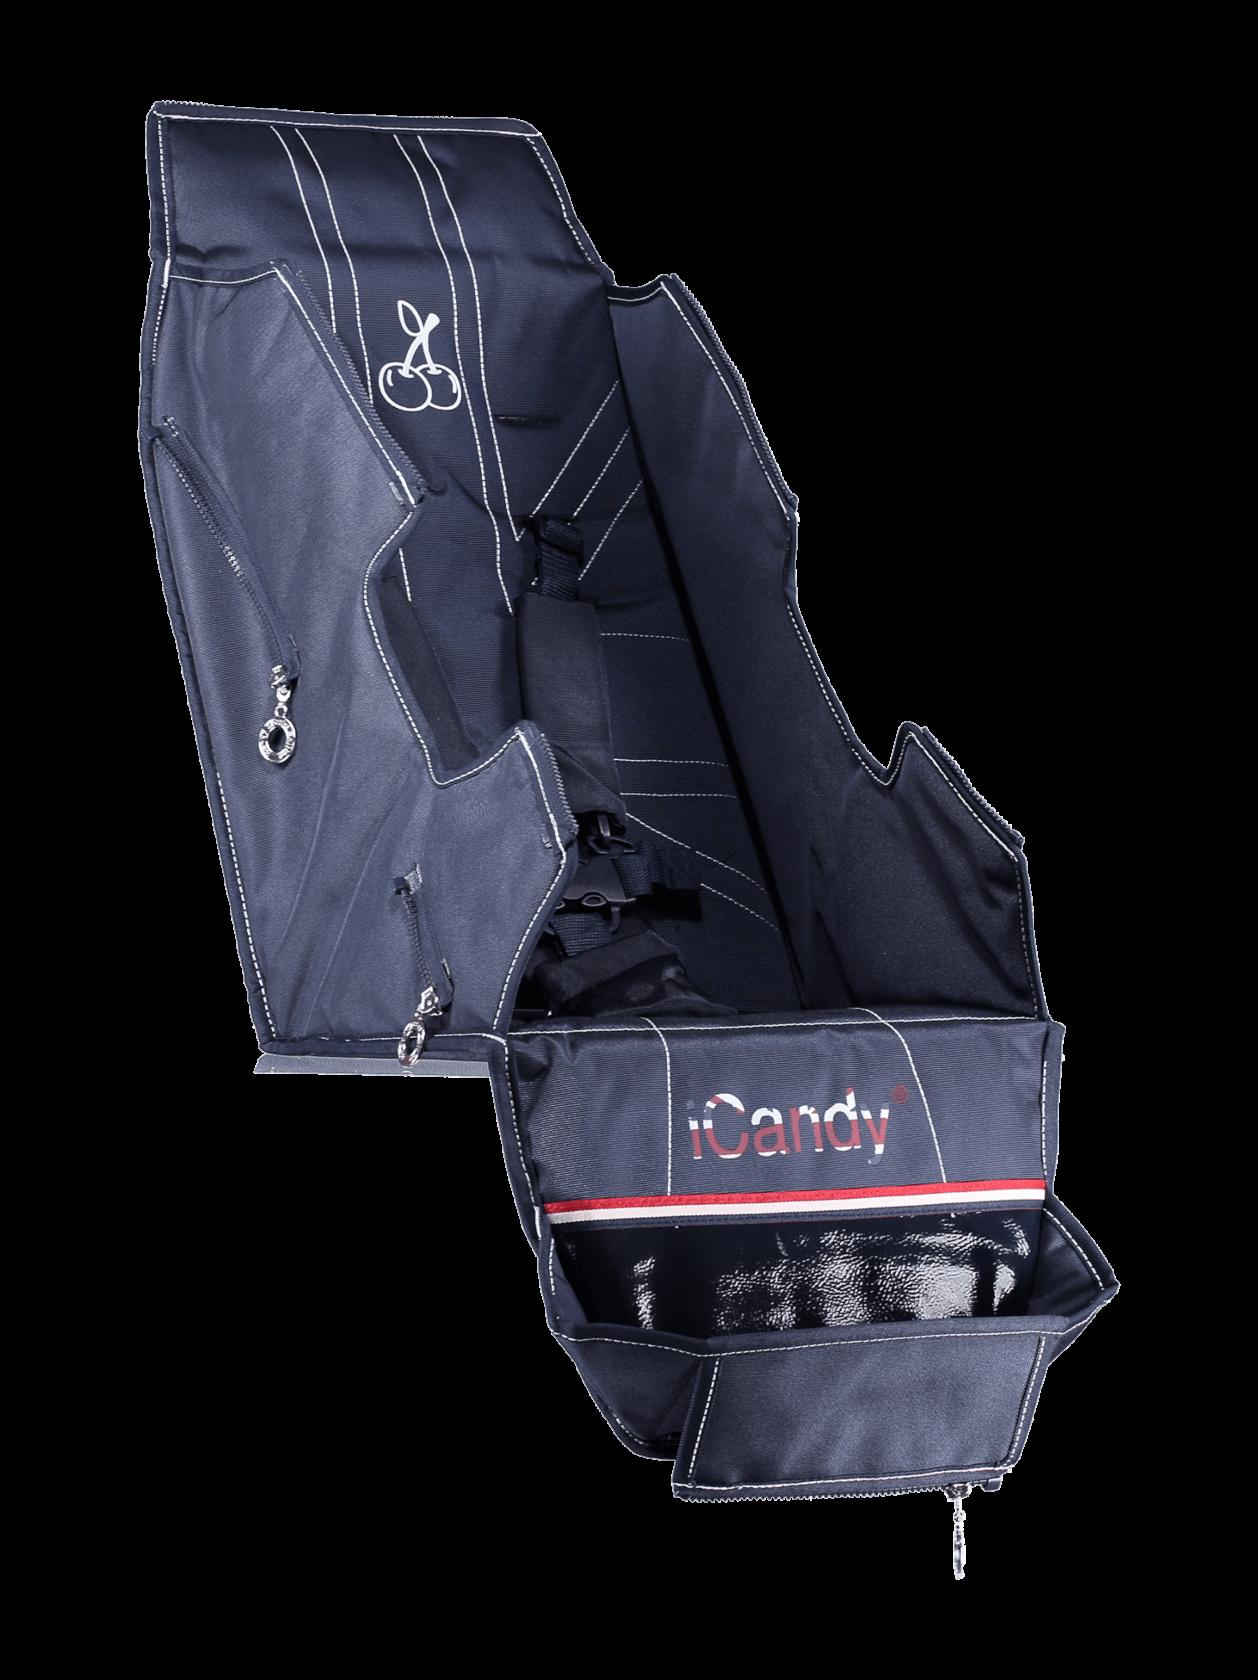 Cherry SE Seat Unit Fabric